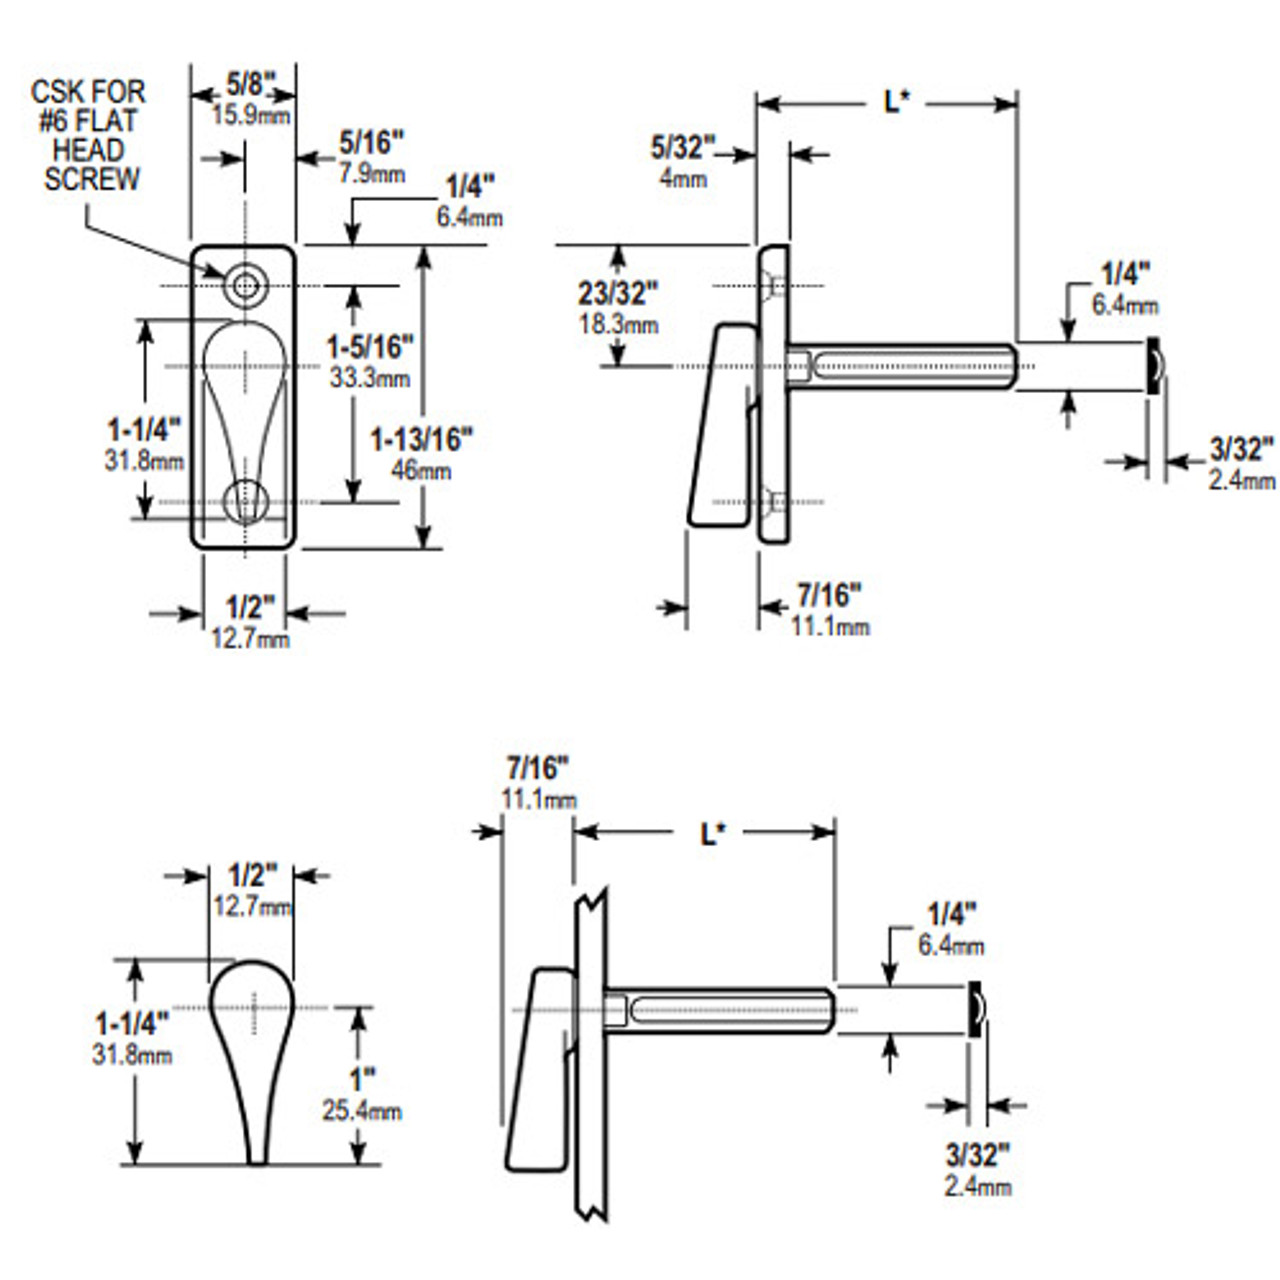 1000-21-22-130 Adams Rite 1000 Series Turns Dimensional View